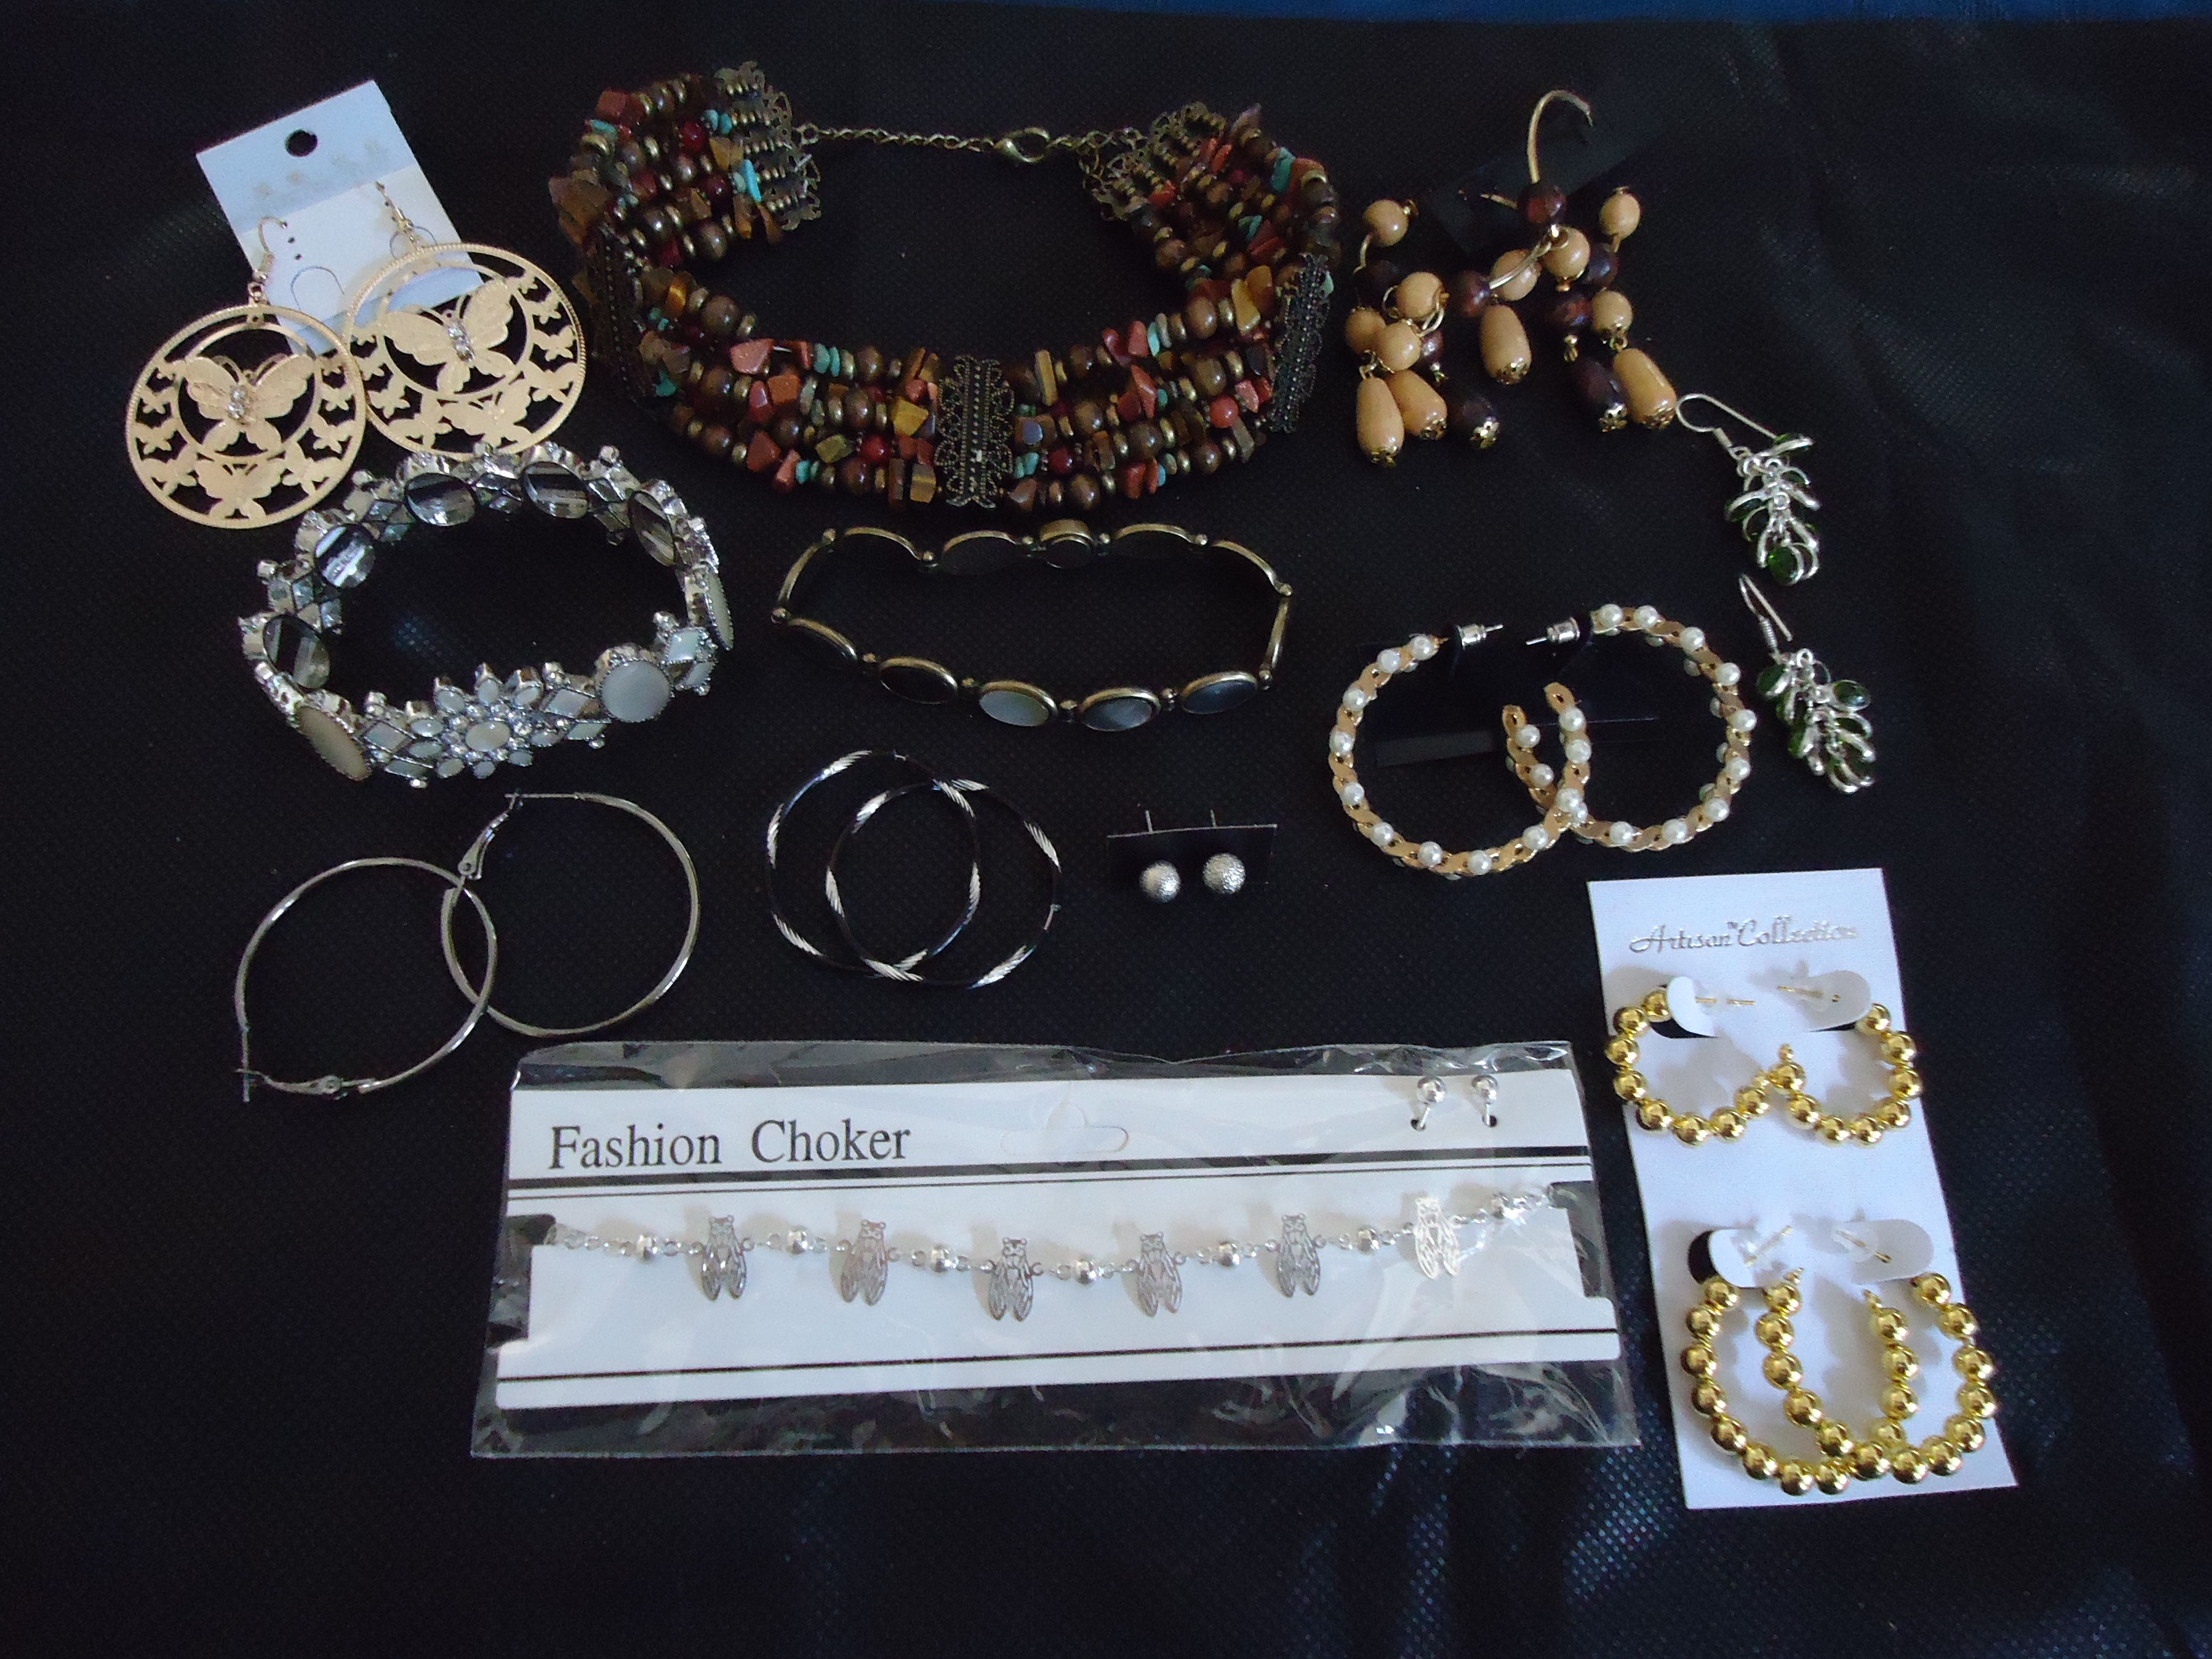 Jewelry, jewelry, and more jewelry!